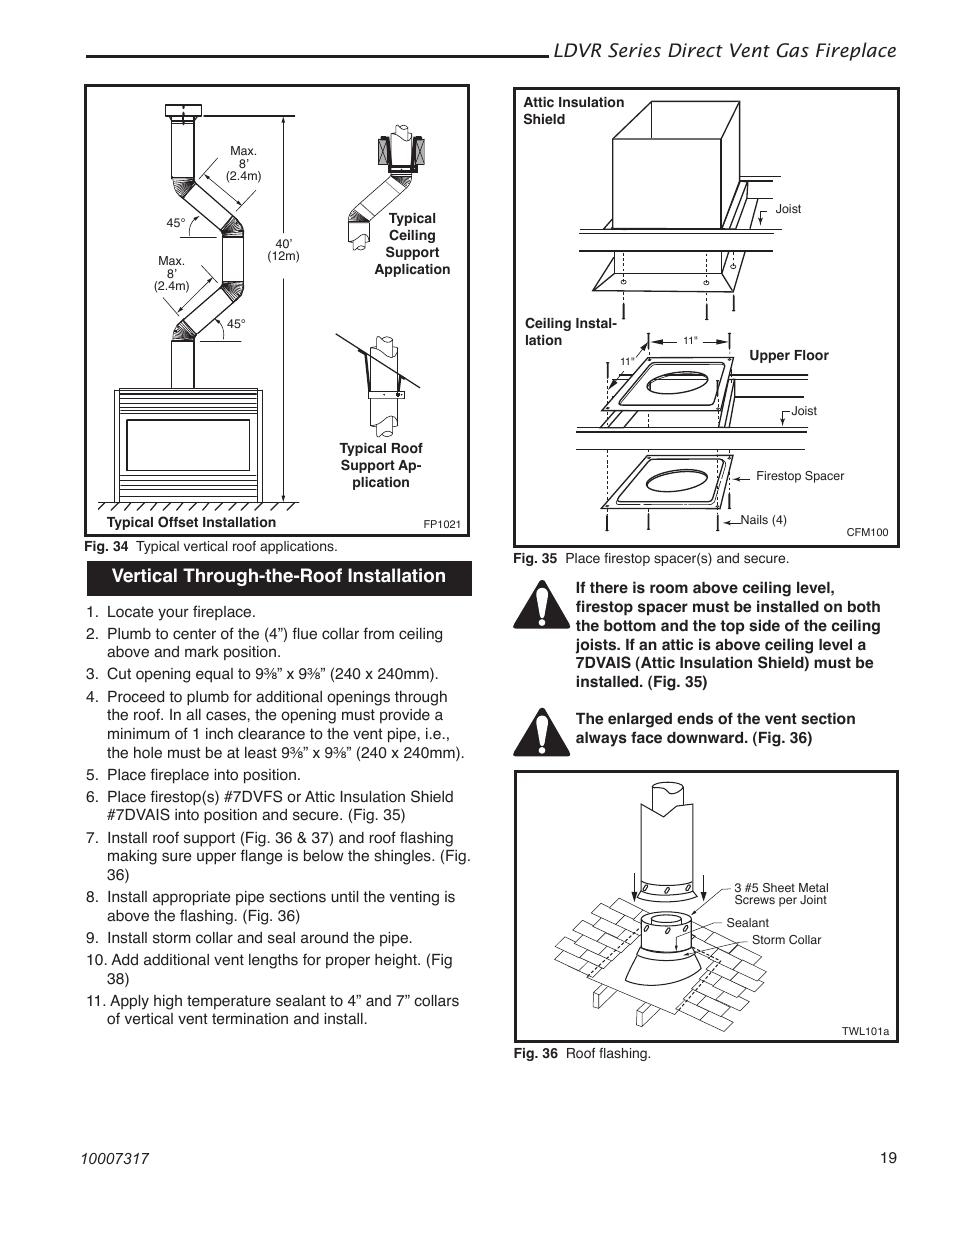 Ldvr series direct vent gas fireplace, Vertical through